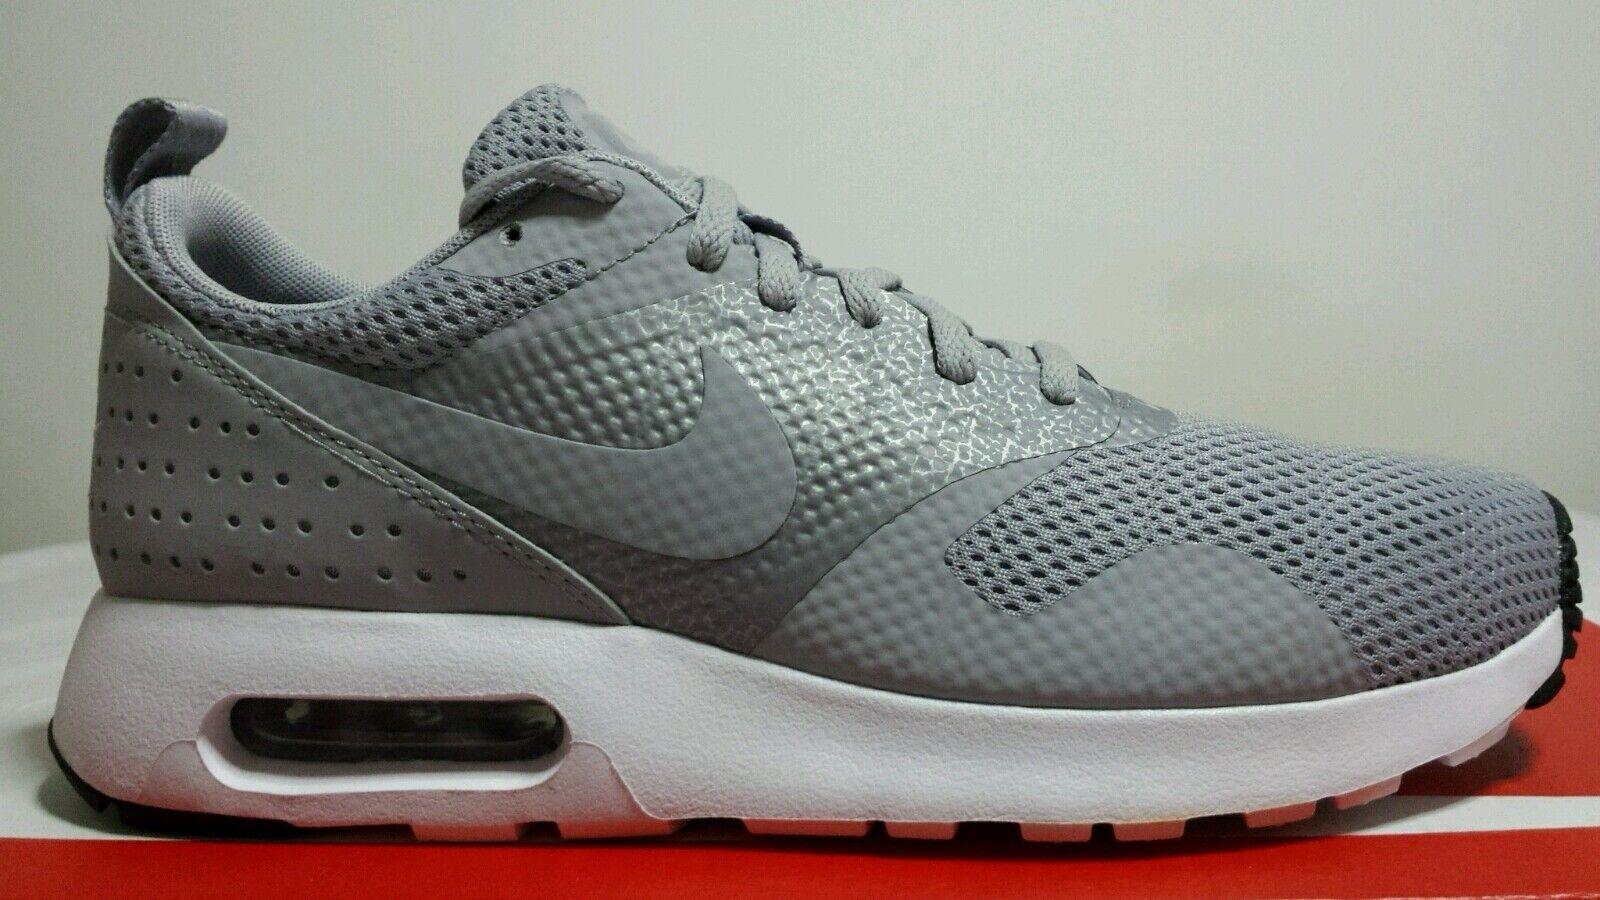 Nike air max tavas 97 grigia baffo grigio gomma bianca nuovo colore okksport